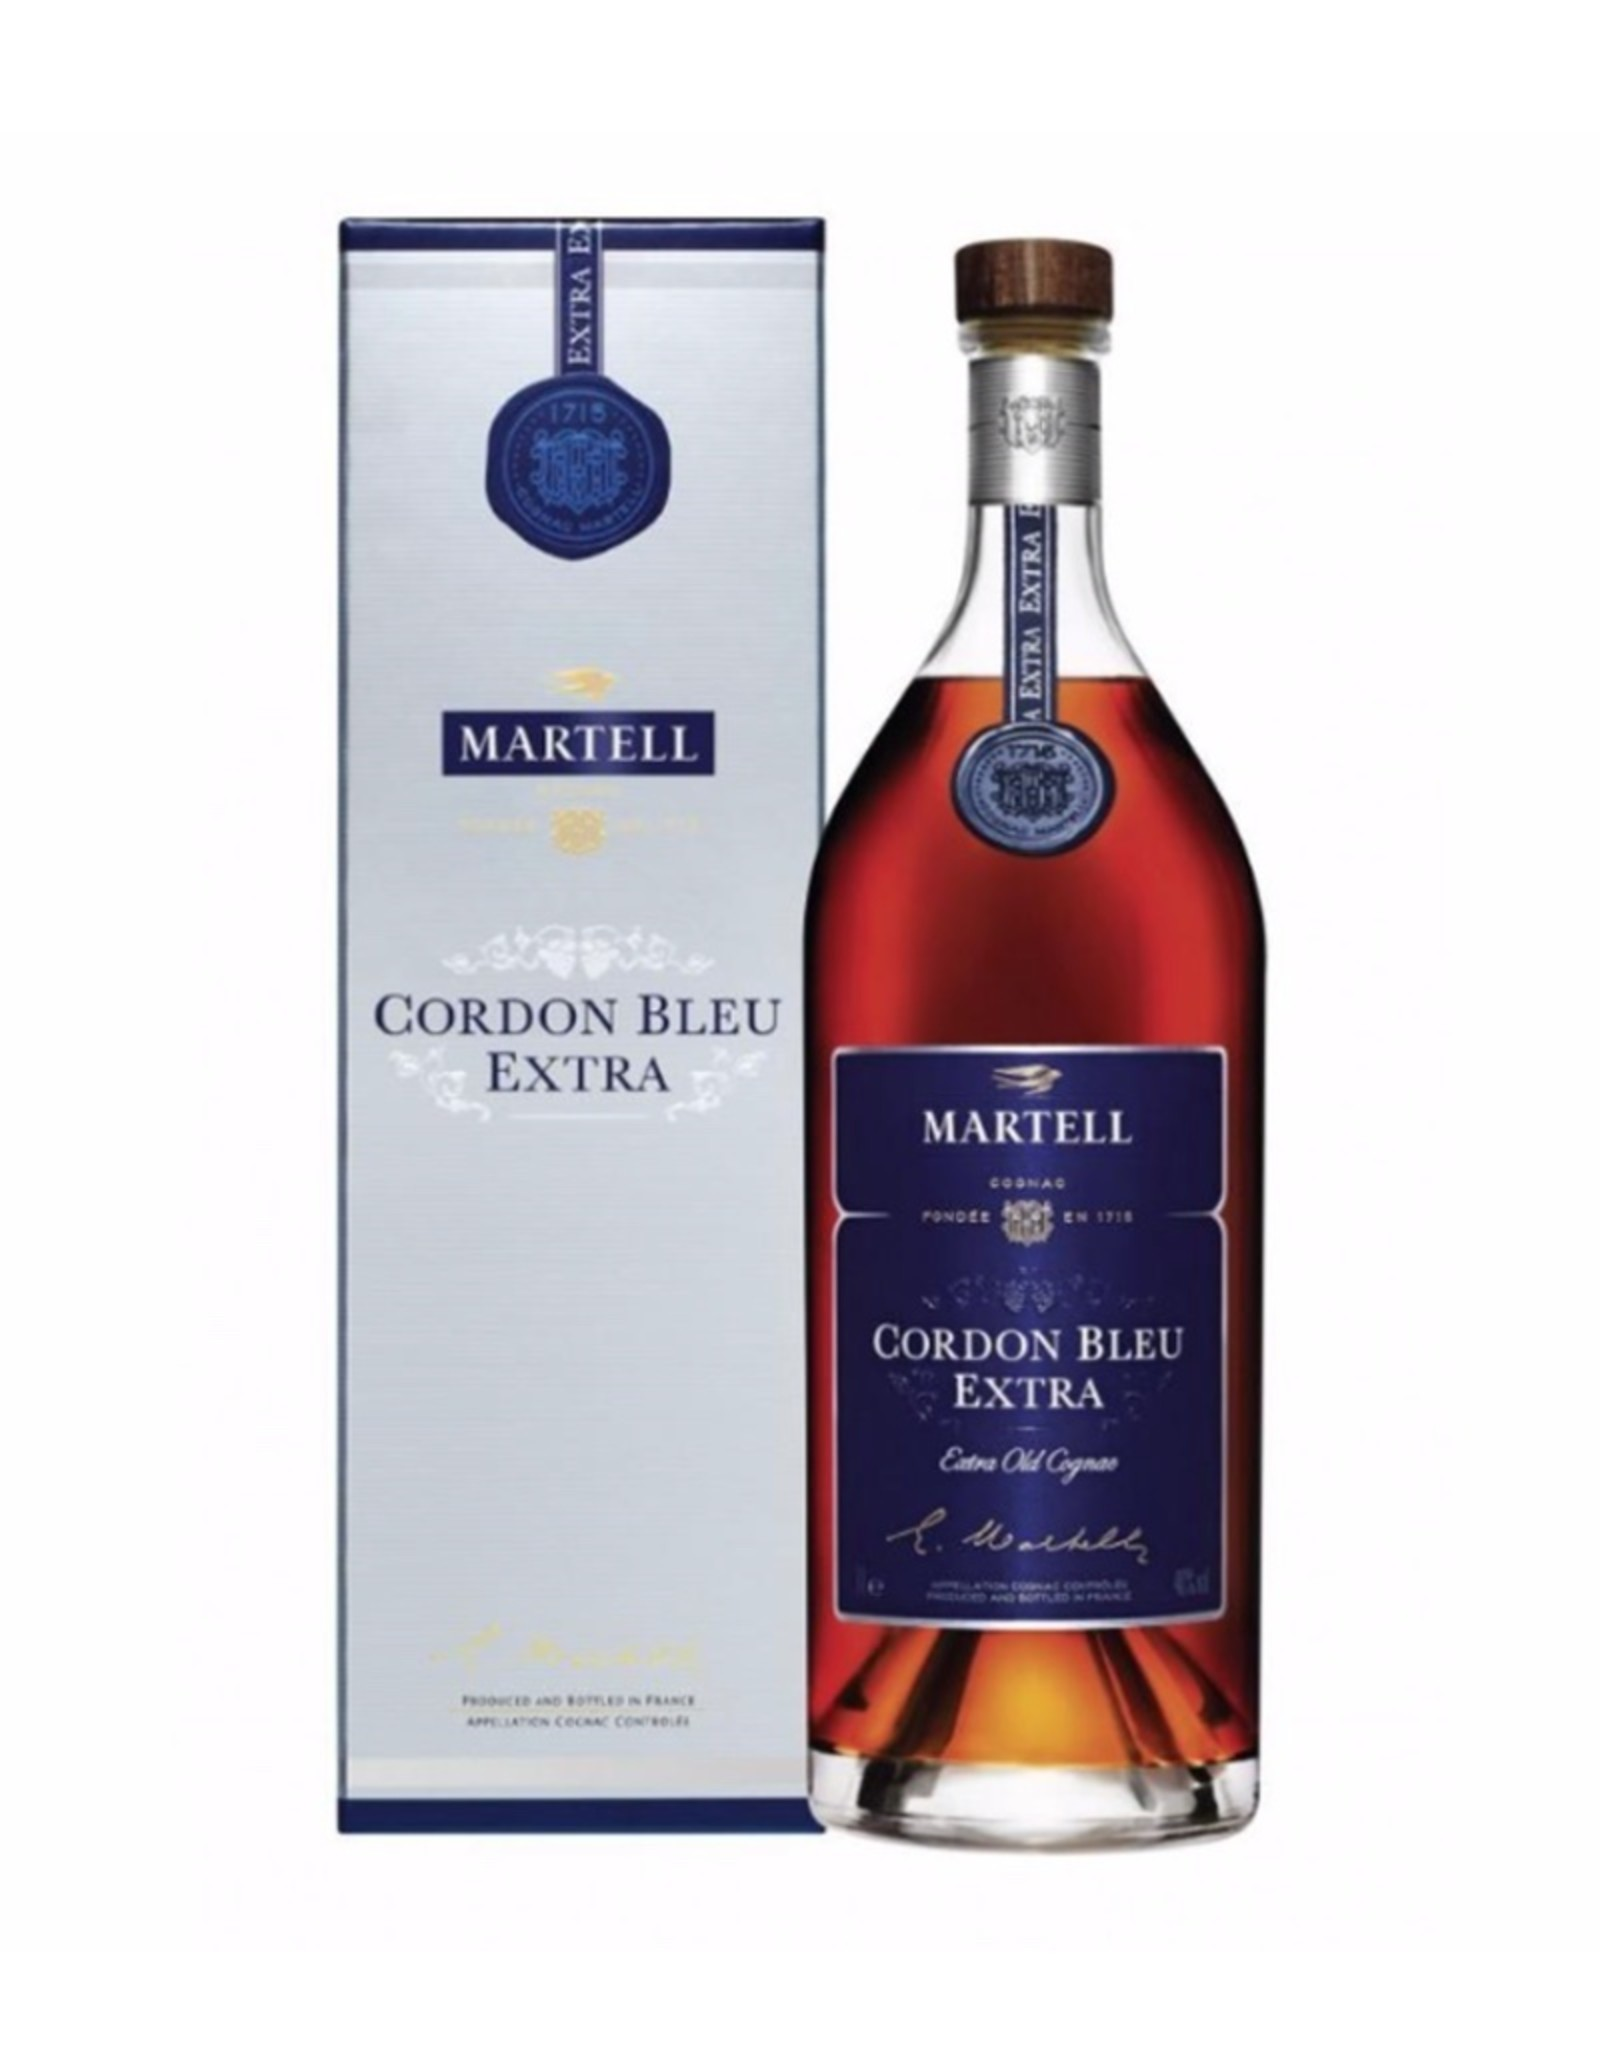 Martell Cordon Bleu Cognac Extra 750ML